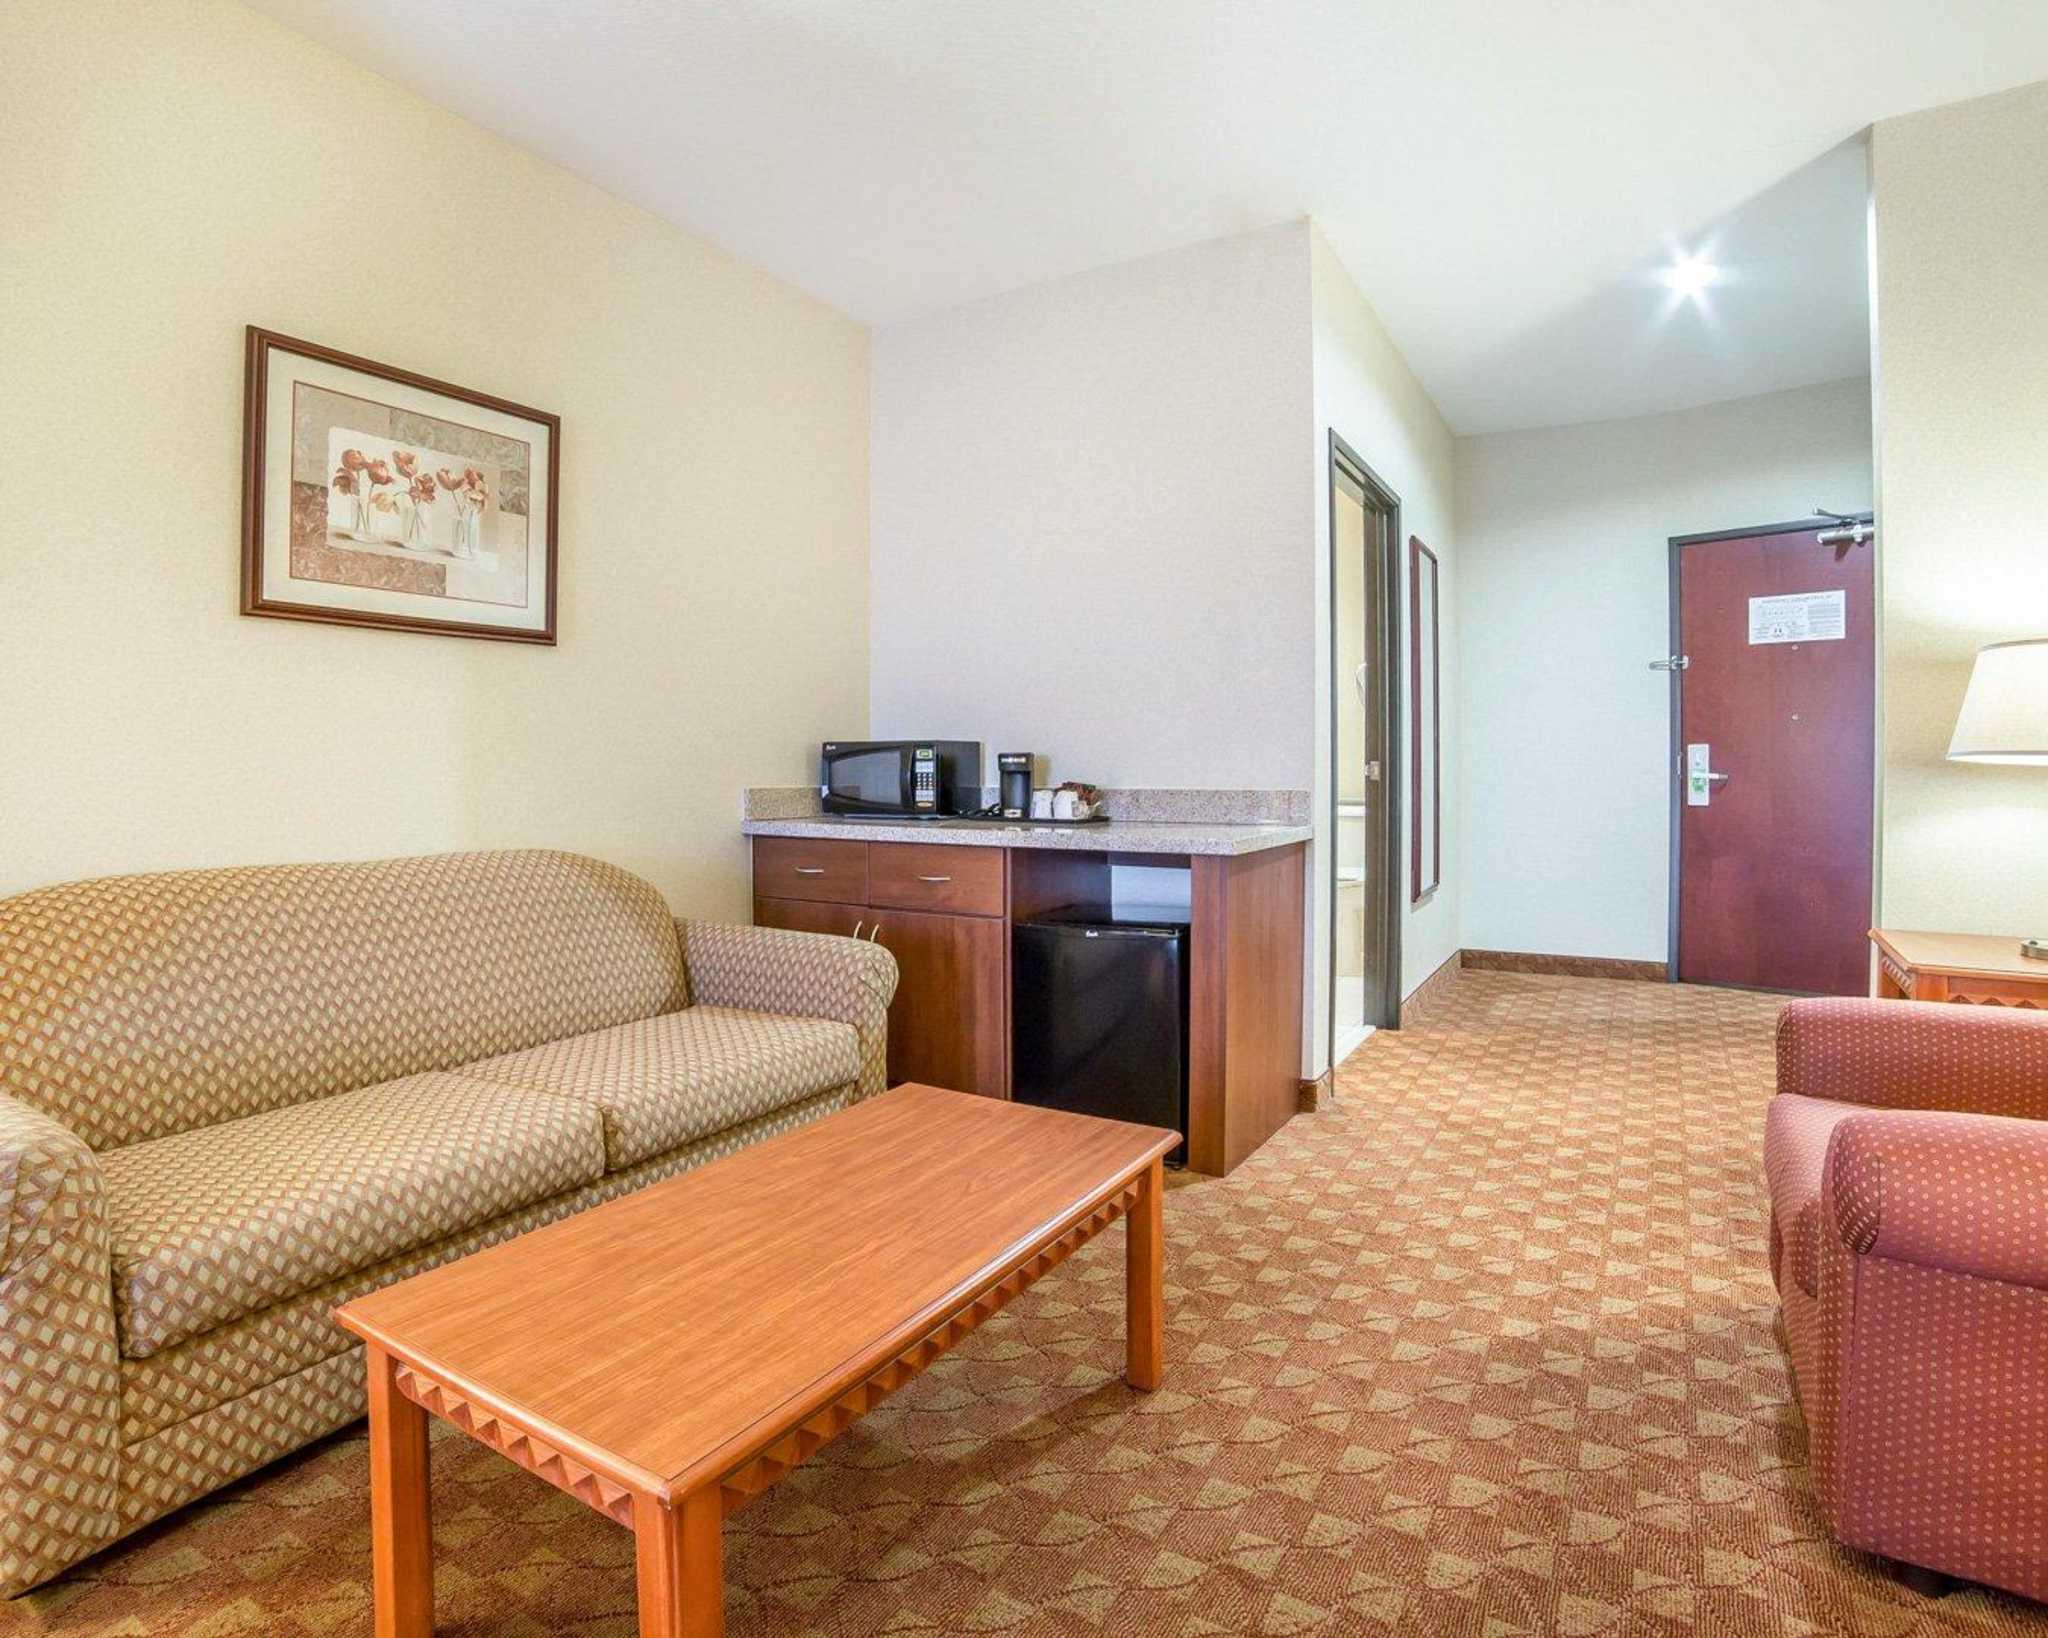 Comfort Inn & Suites Las Vegas - Nellis image 19